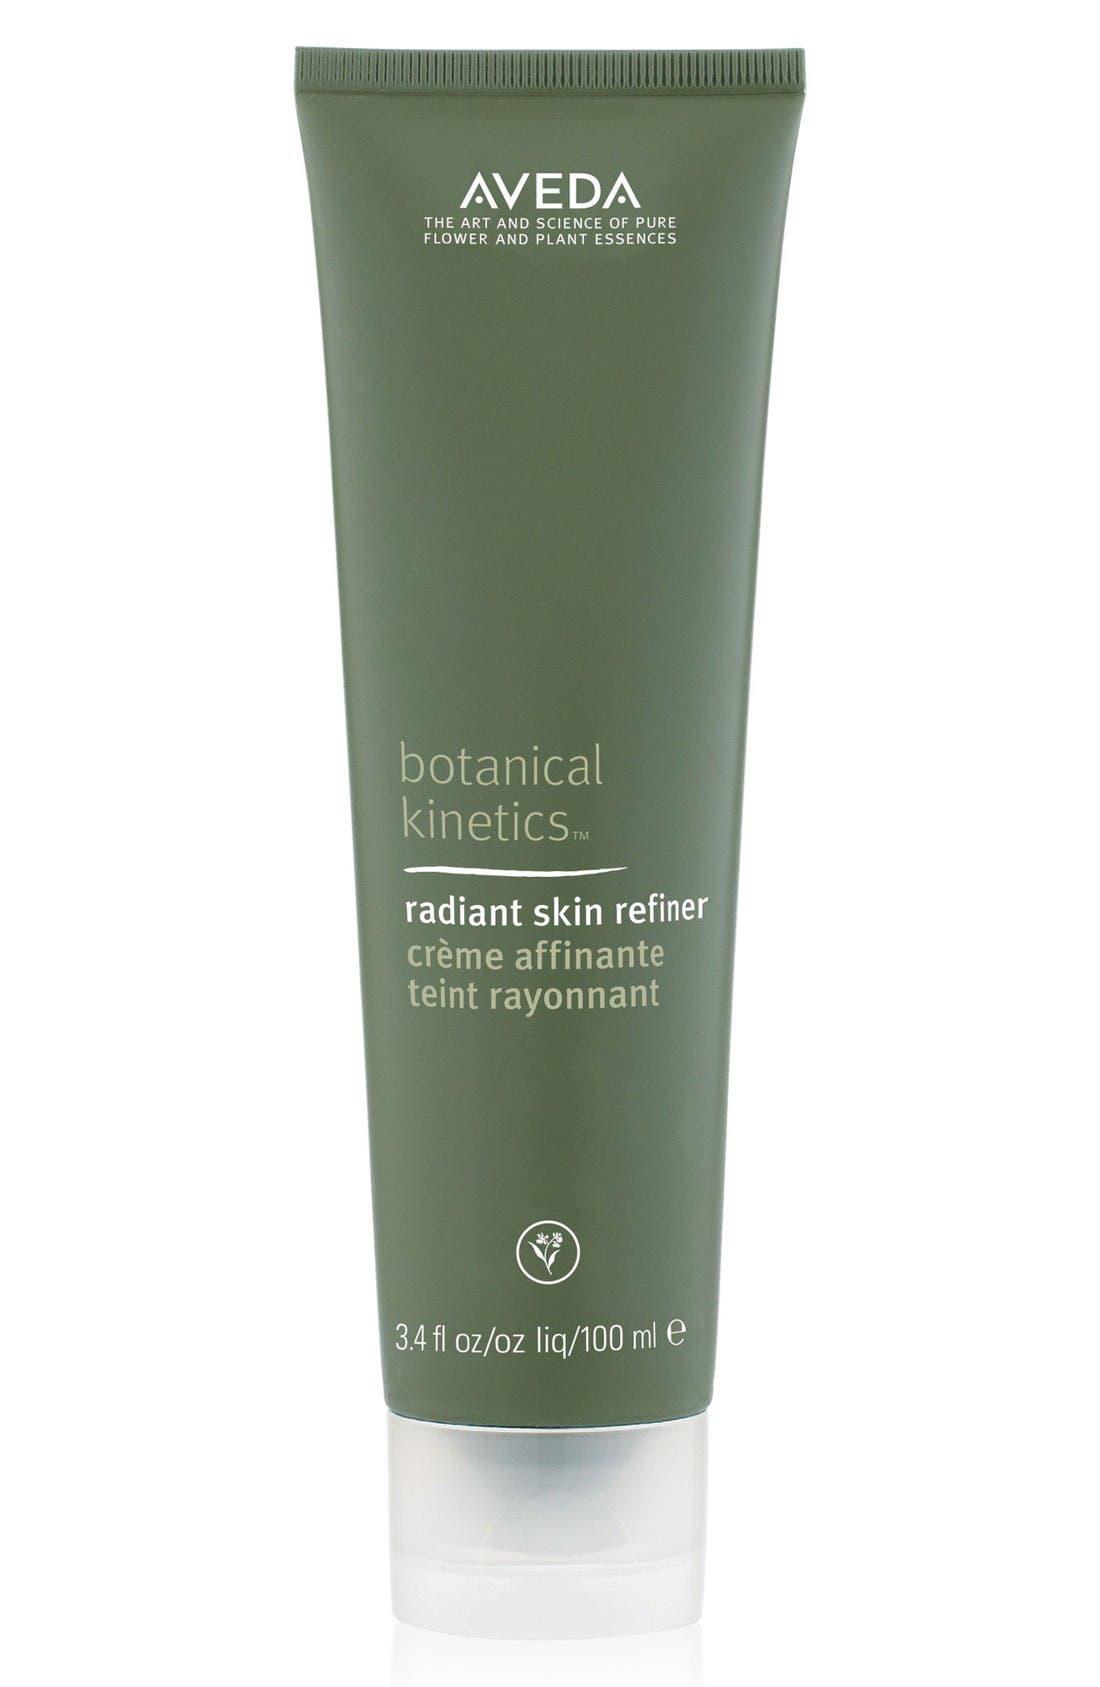 Aveda botanical kinetics™ Radiant Skin Refiner